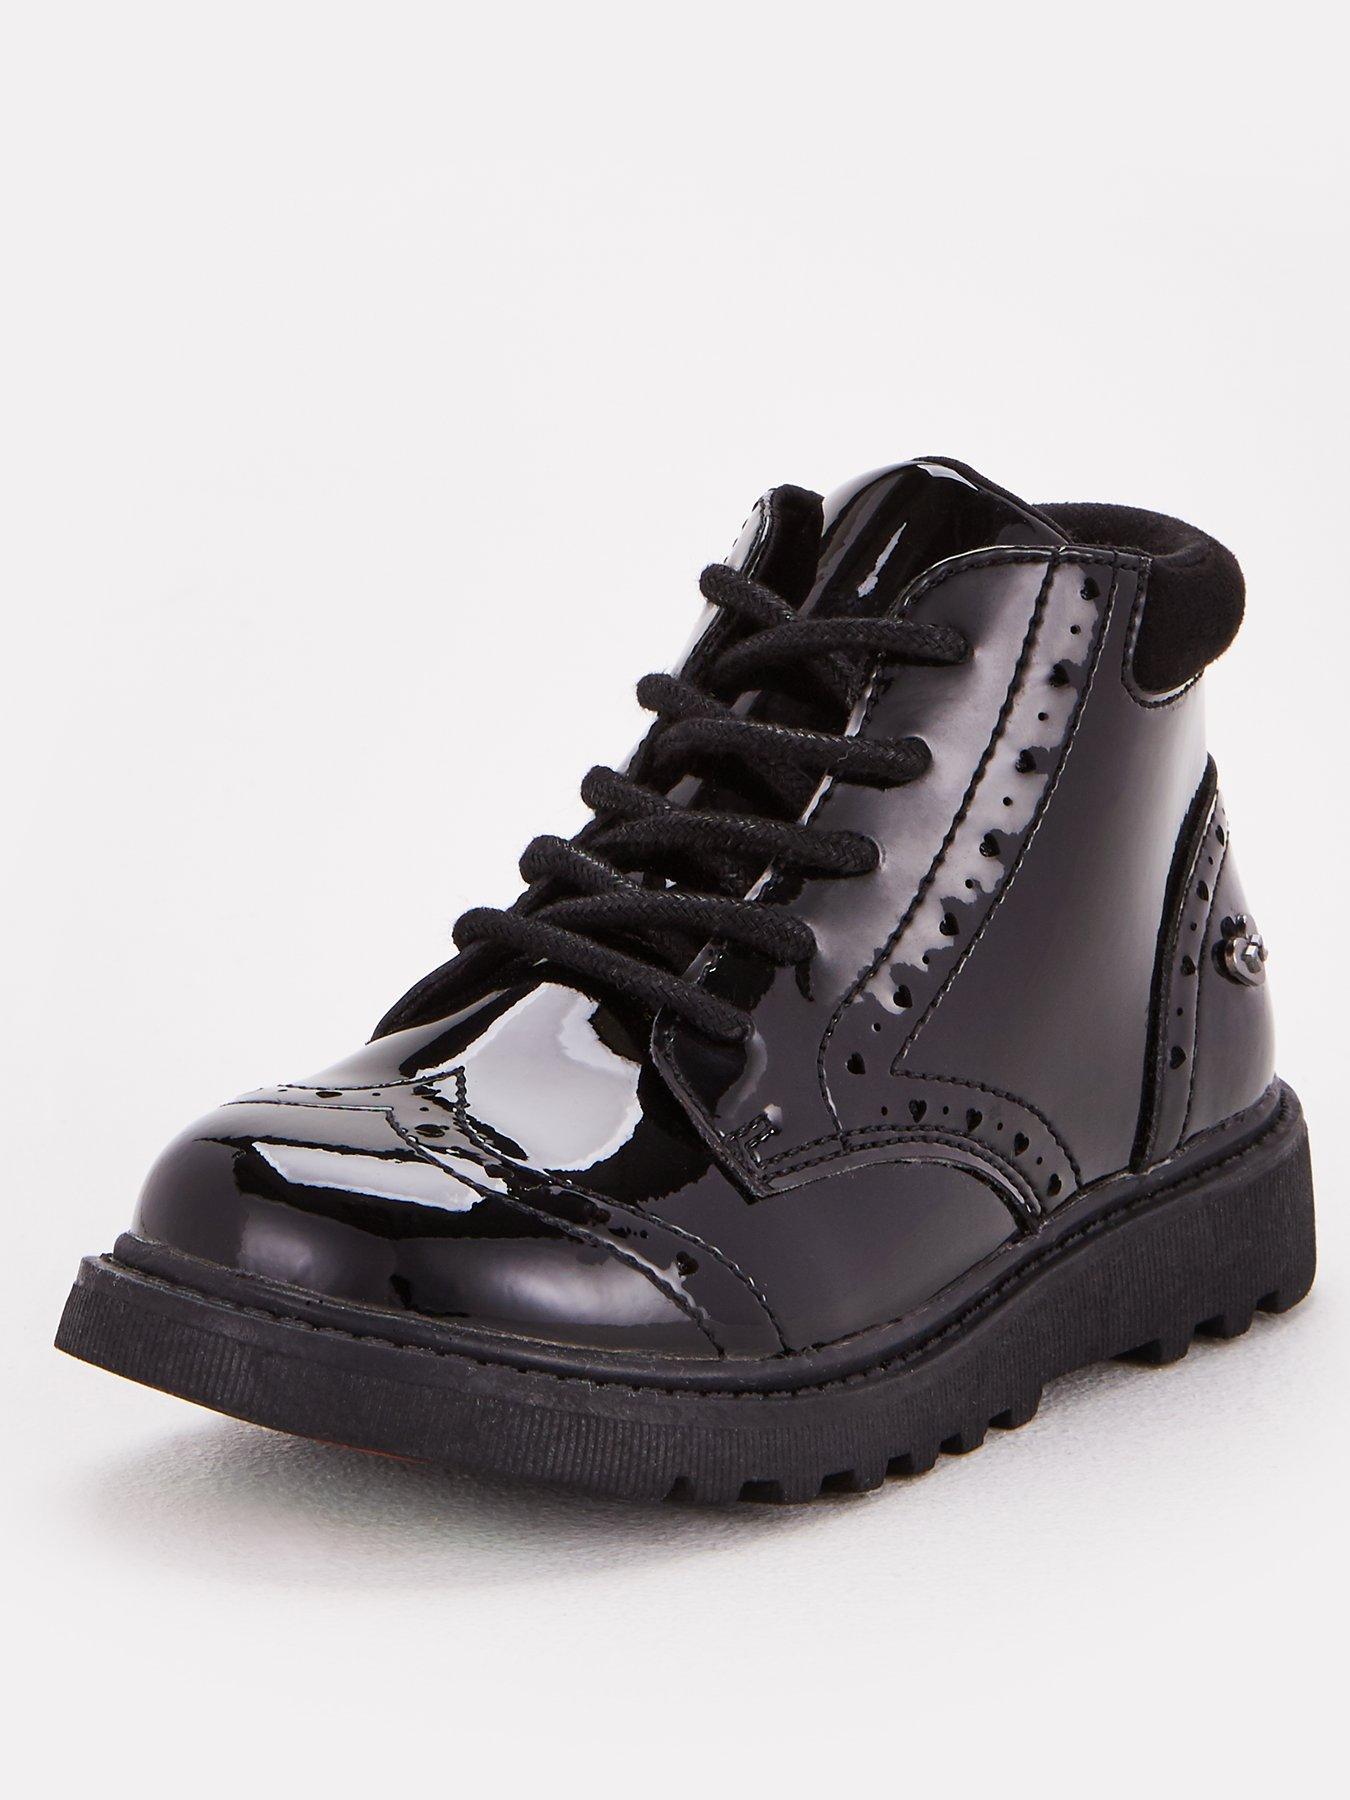 Girl | School shoes | Shoes \u0026 boots